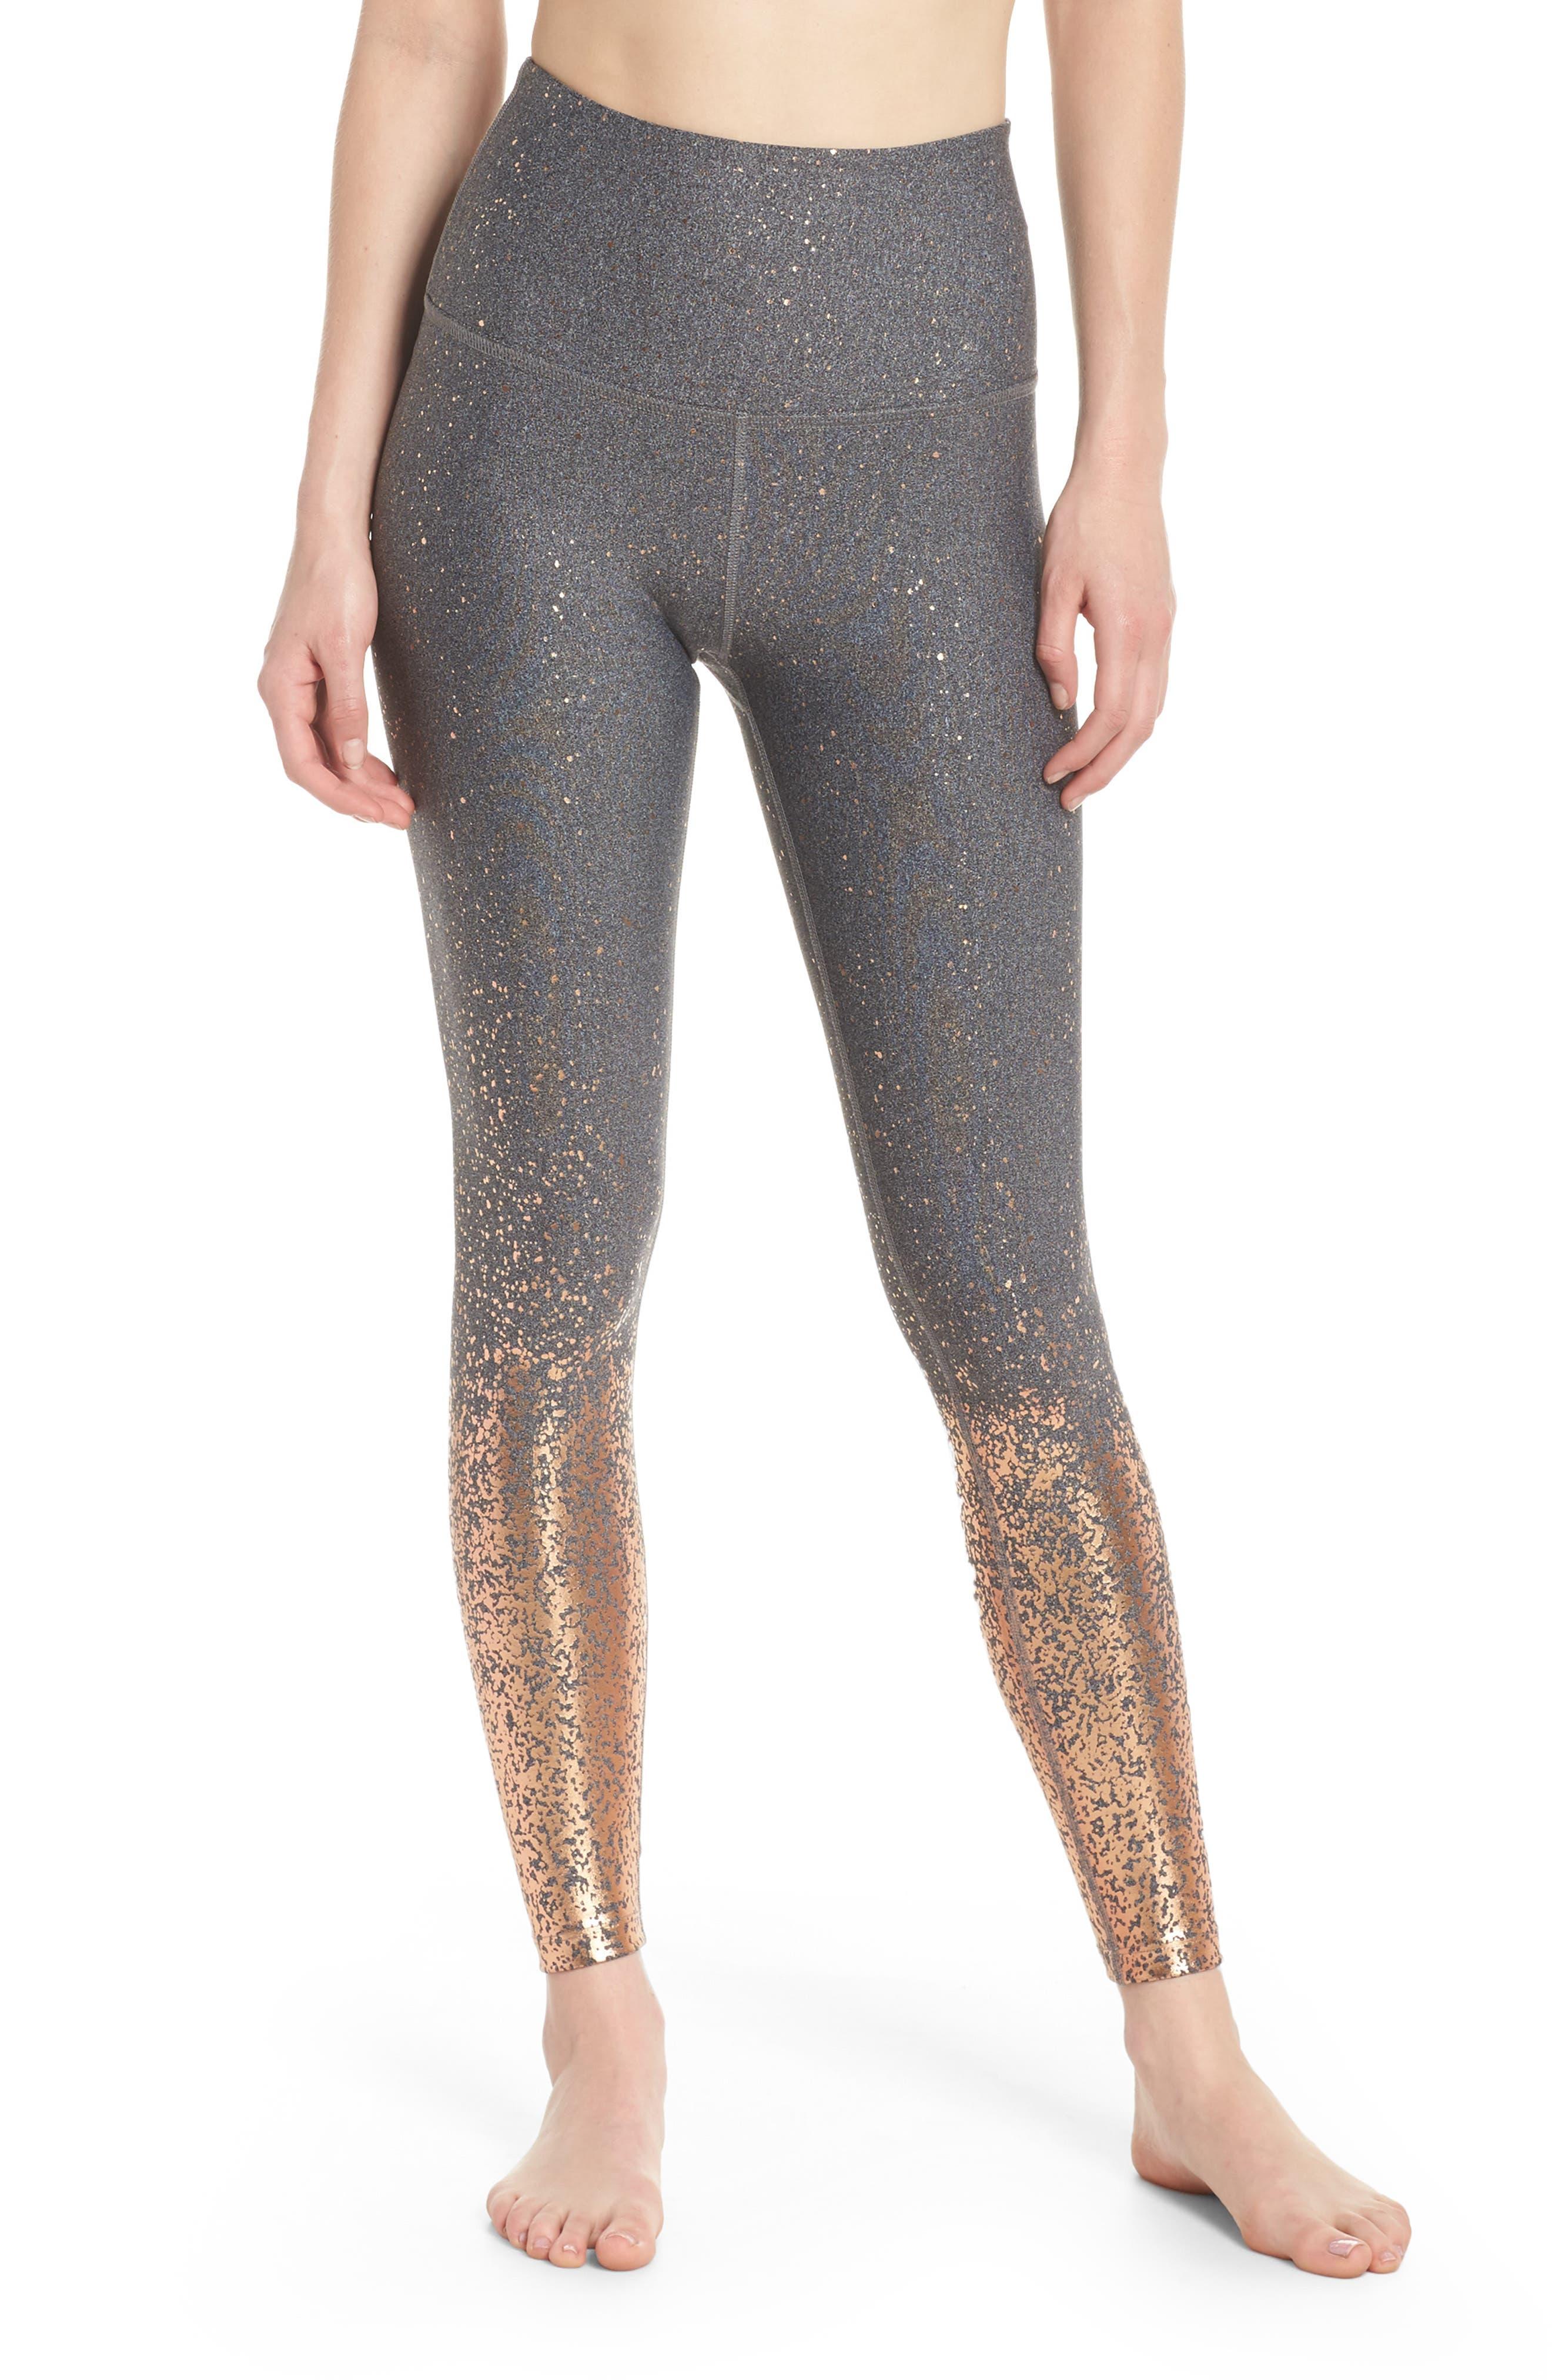 Ombré High Waist Leggings,                         Main,                         color, Black-White Rose Gold Speckle